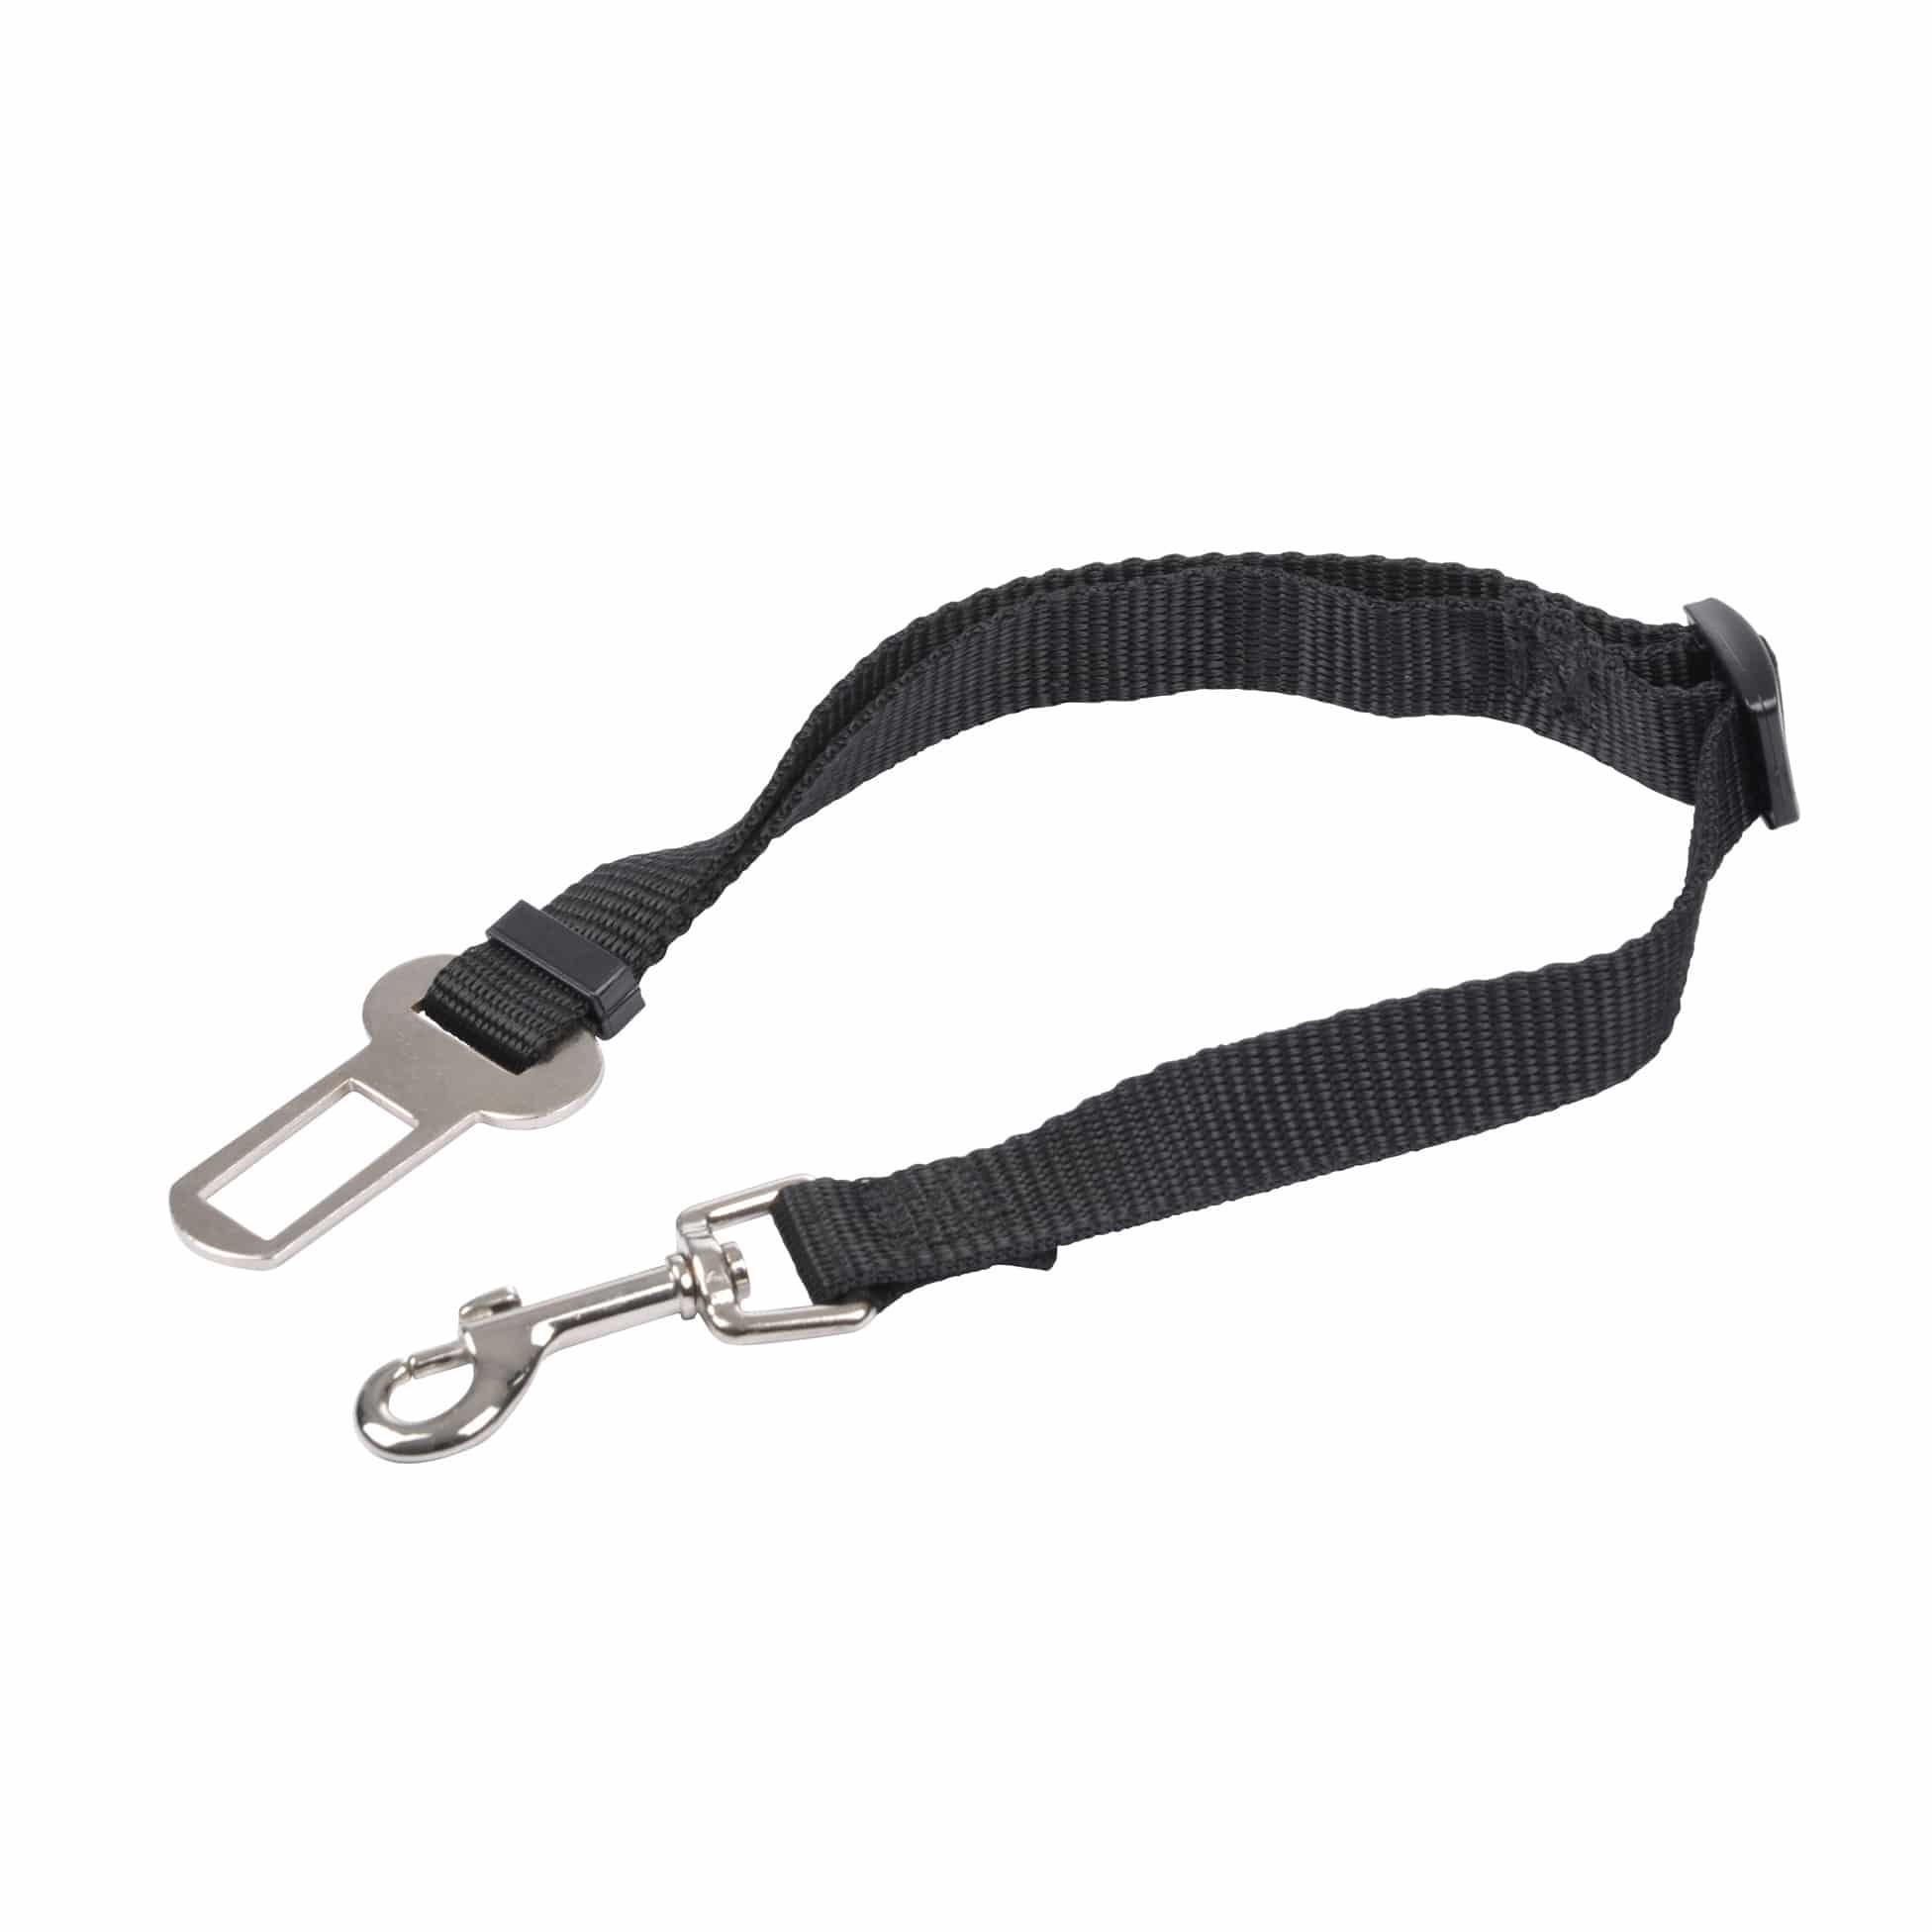 4goodz autogordel hondenriem 30-50cm - veiligheidsgordel hond - Zwart